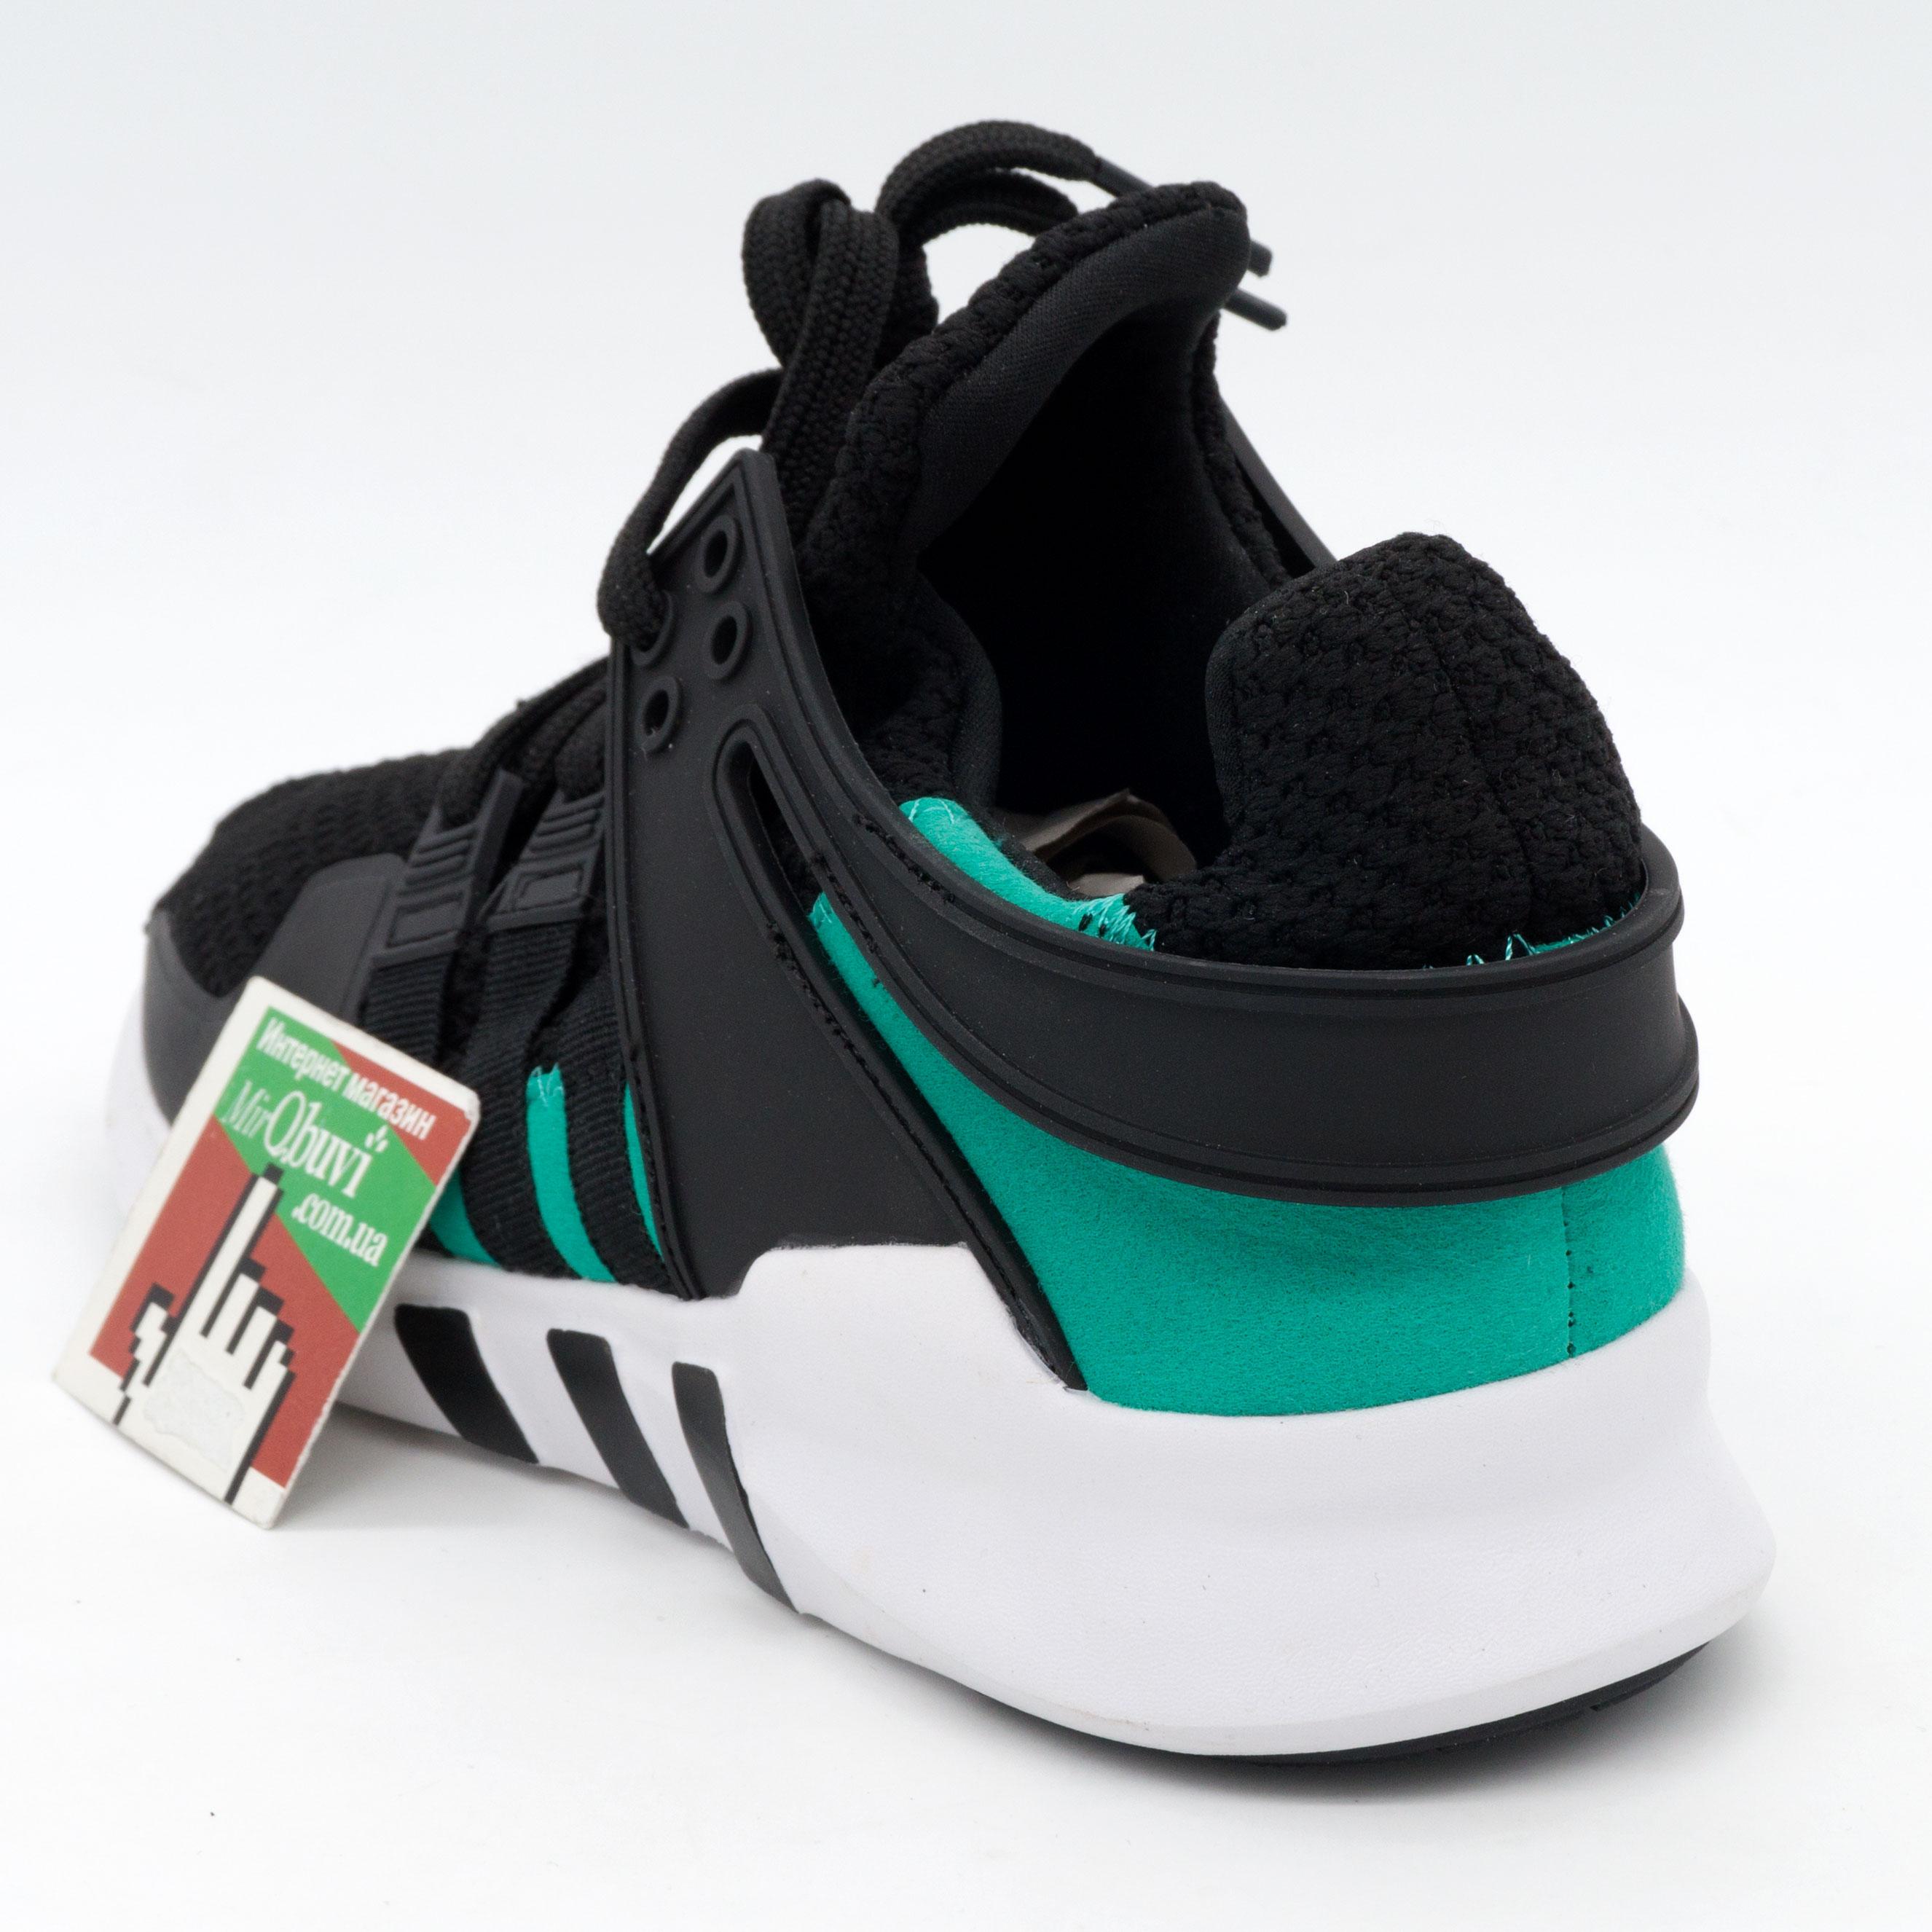 фото back Кроссовки Adidas Equipment Support (EQT) черные с зеленым. Топ качество! back